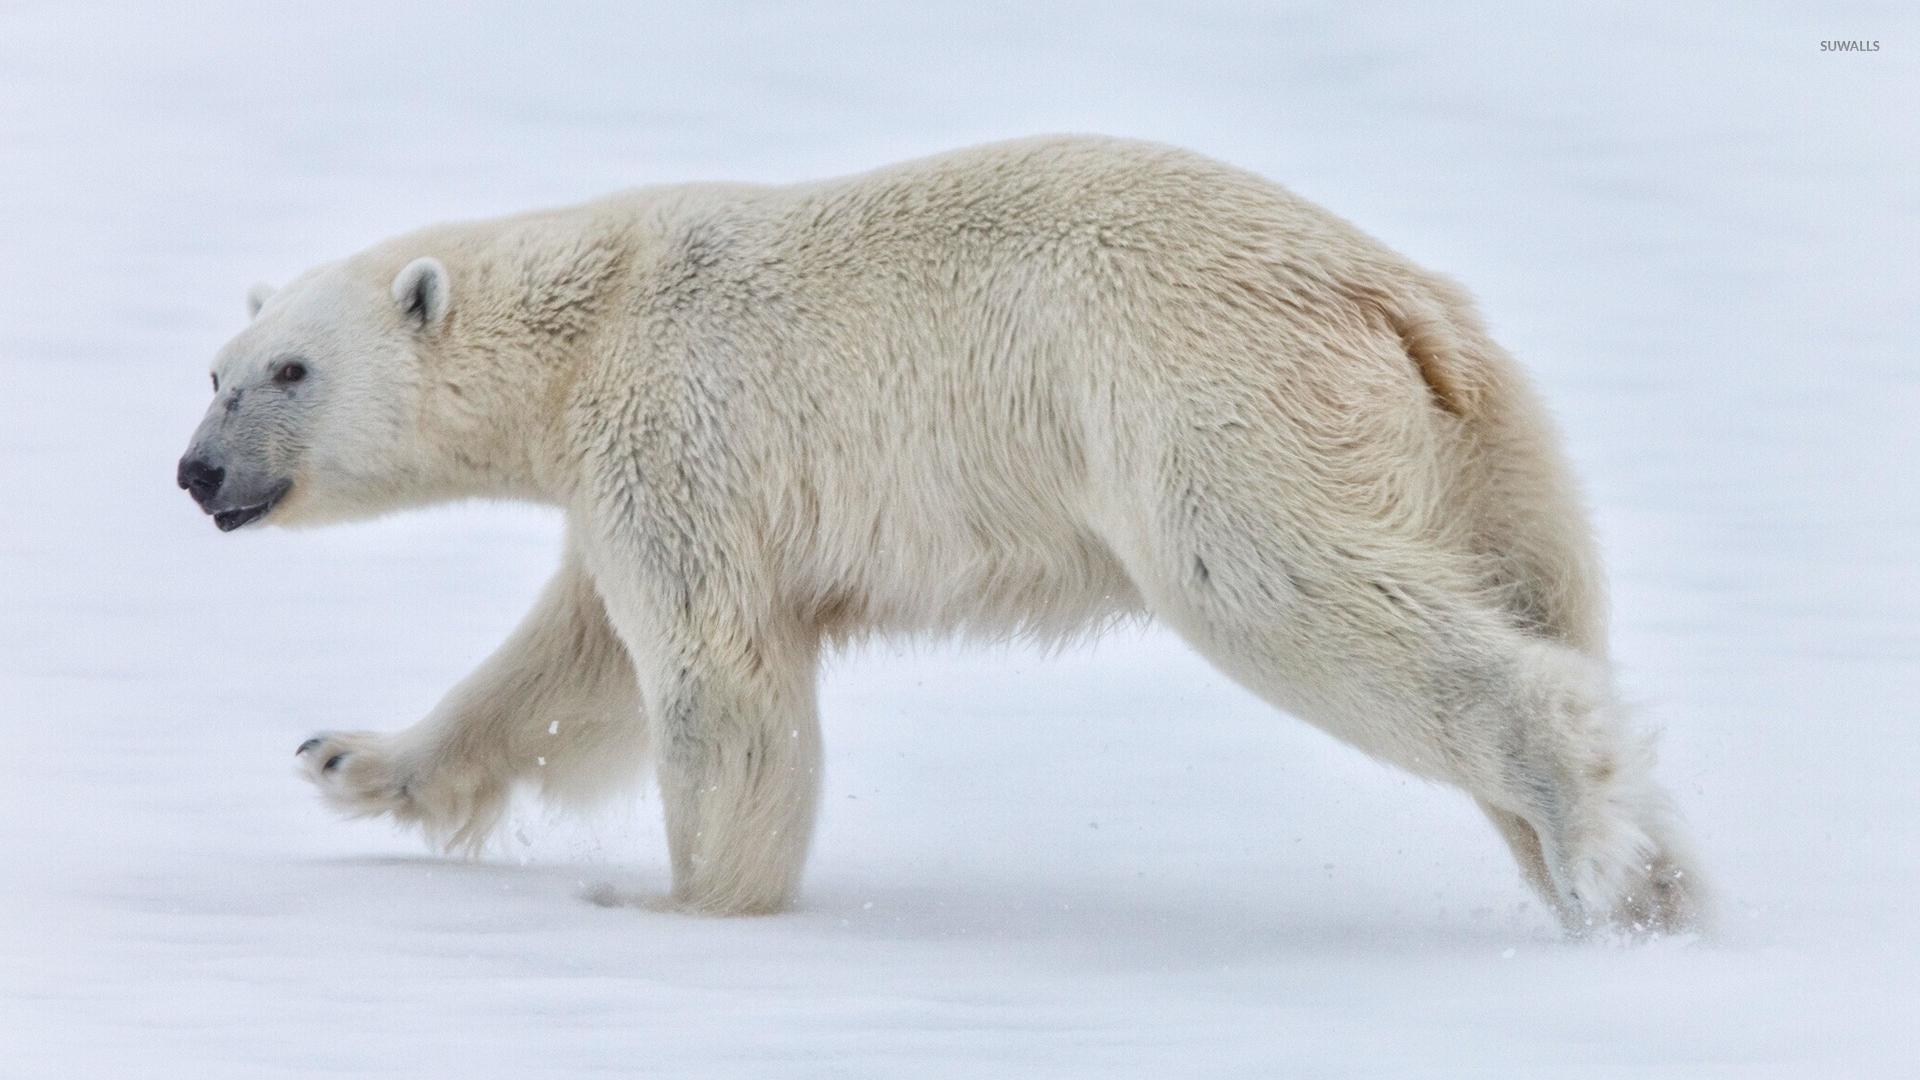 polar bear walking in the snow wallpaper animal